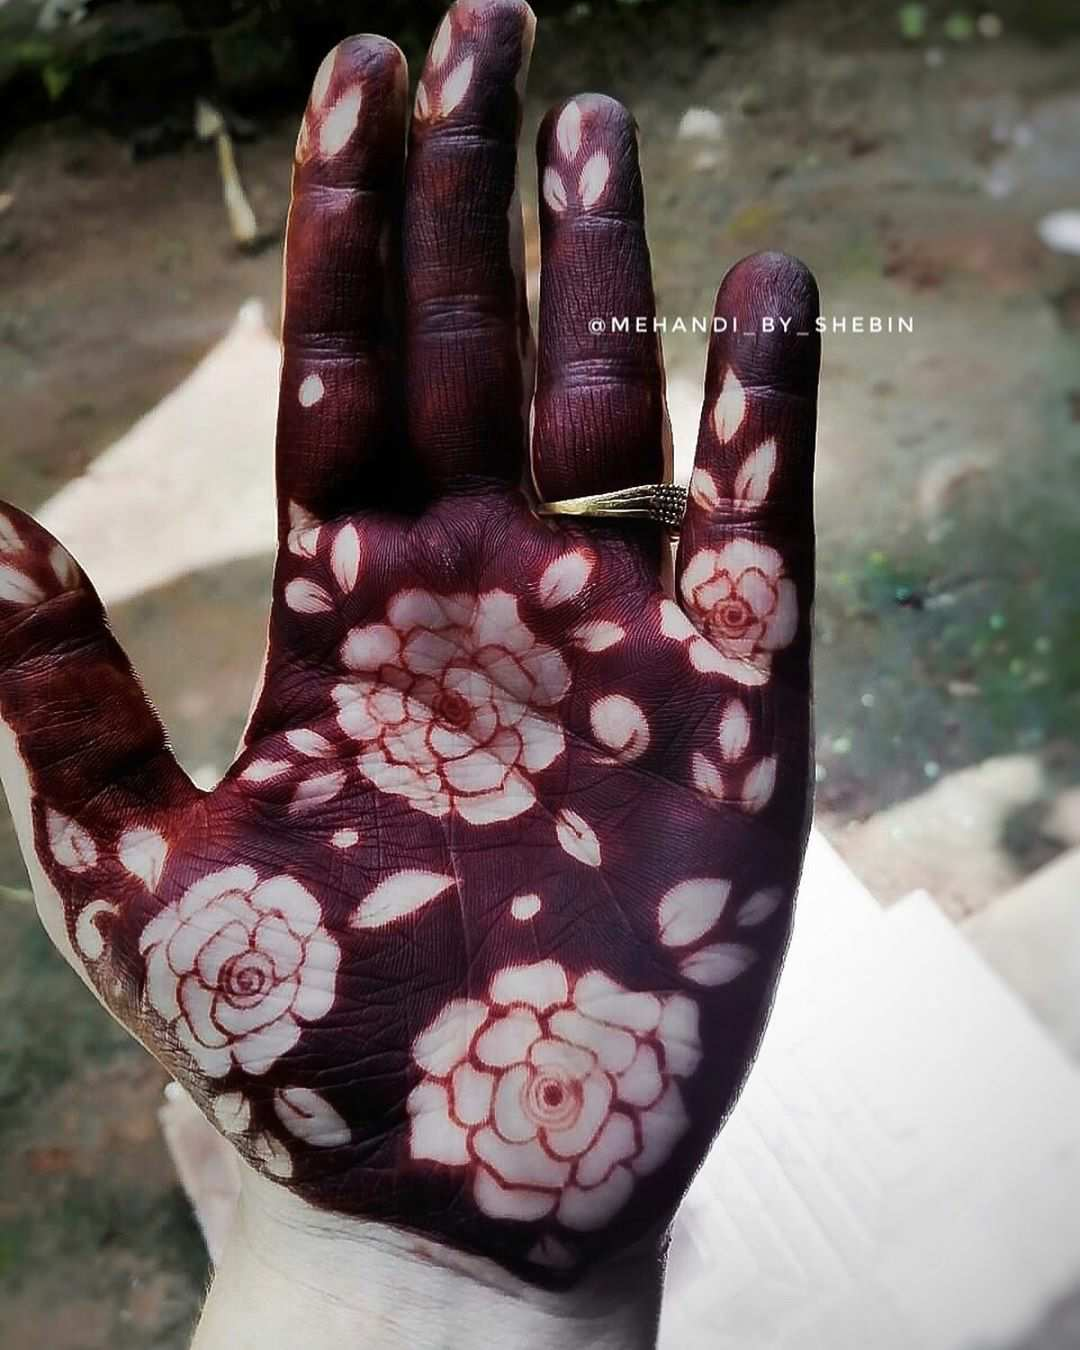 Negative Space Roses Mehndi Design